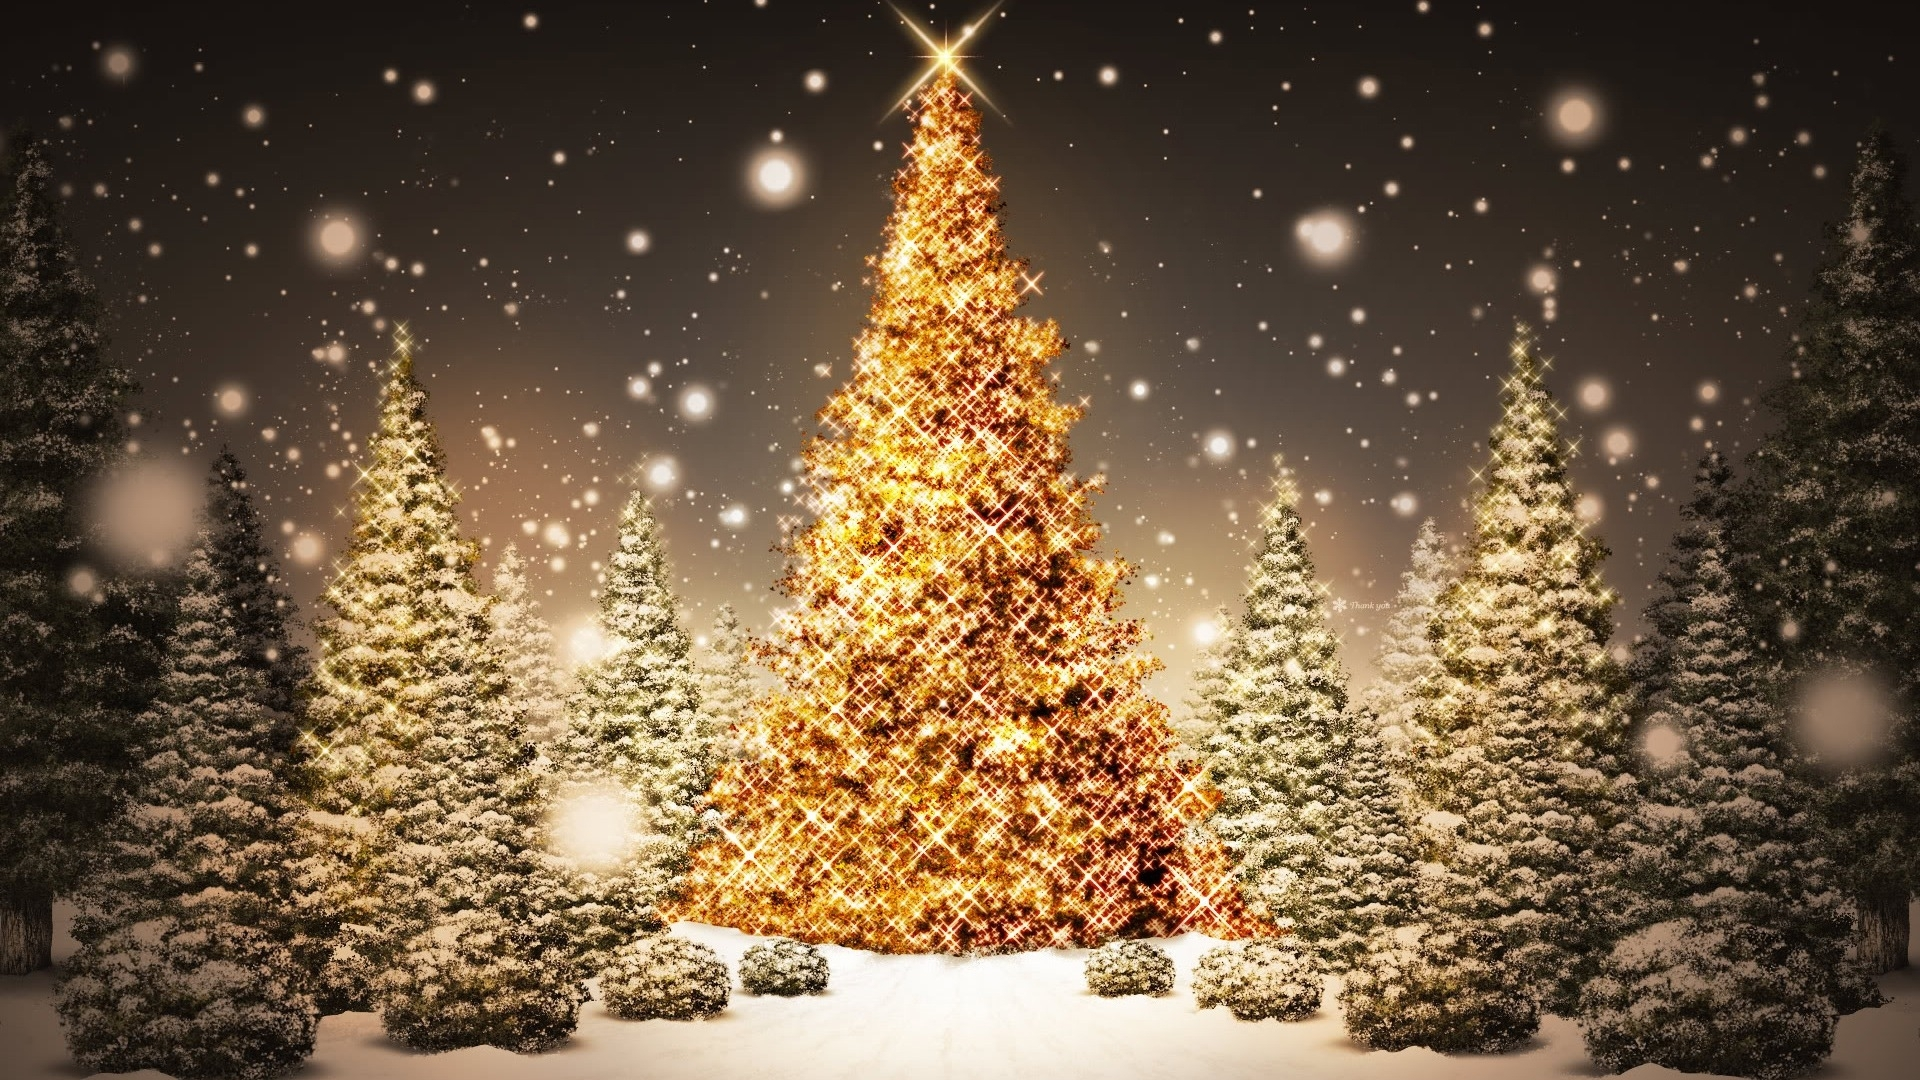 christmas lights widescreen wallpaper. - media file | pixelstalk